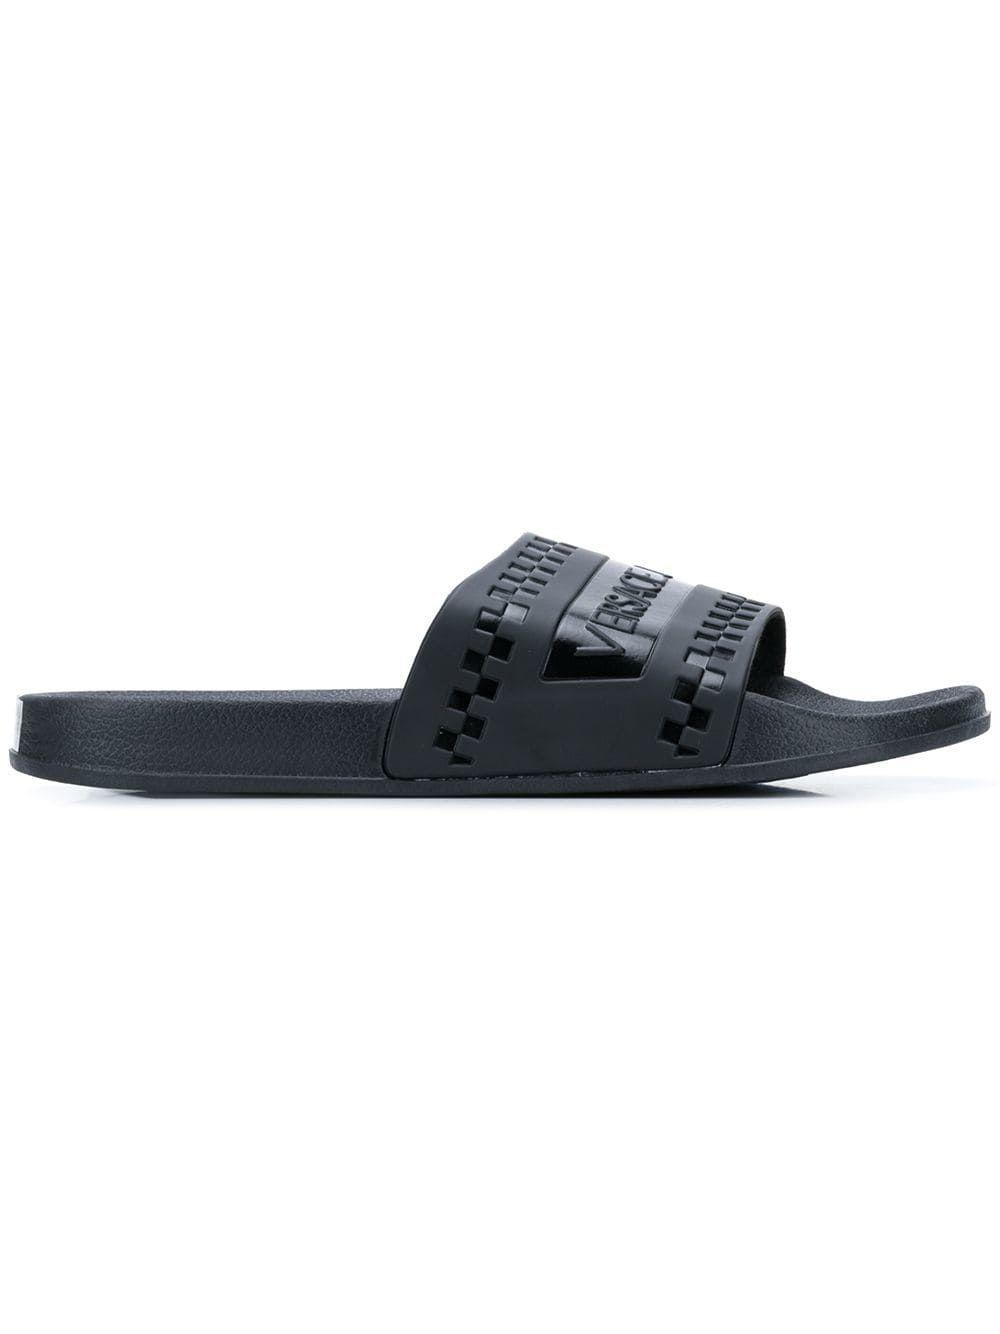 e97553f6f357 VERSACE JEANS VERSACE JEANS LOGO SLIDERS - BLACK.  versacejeans  shoes